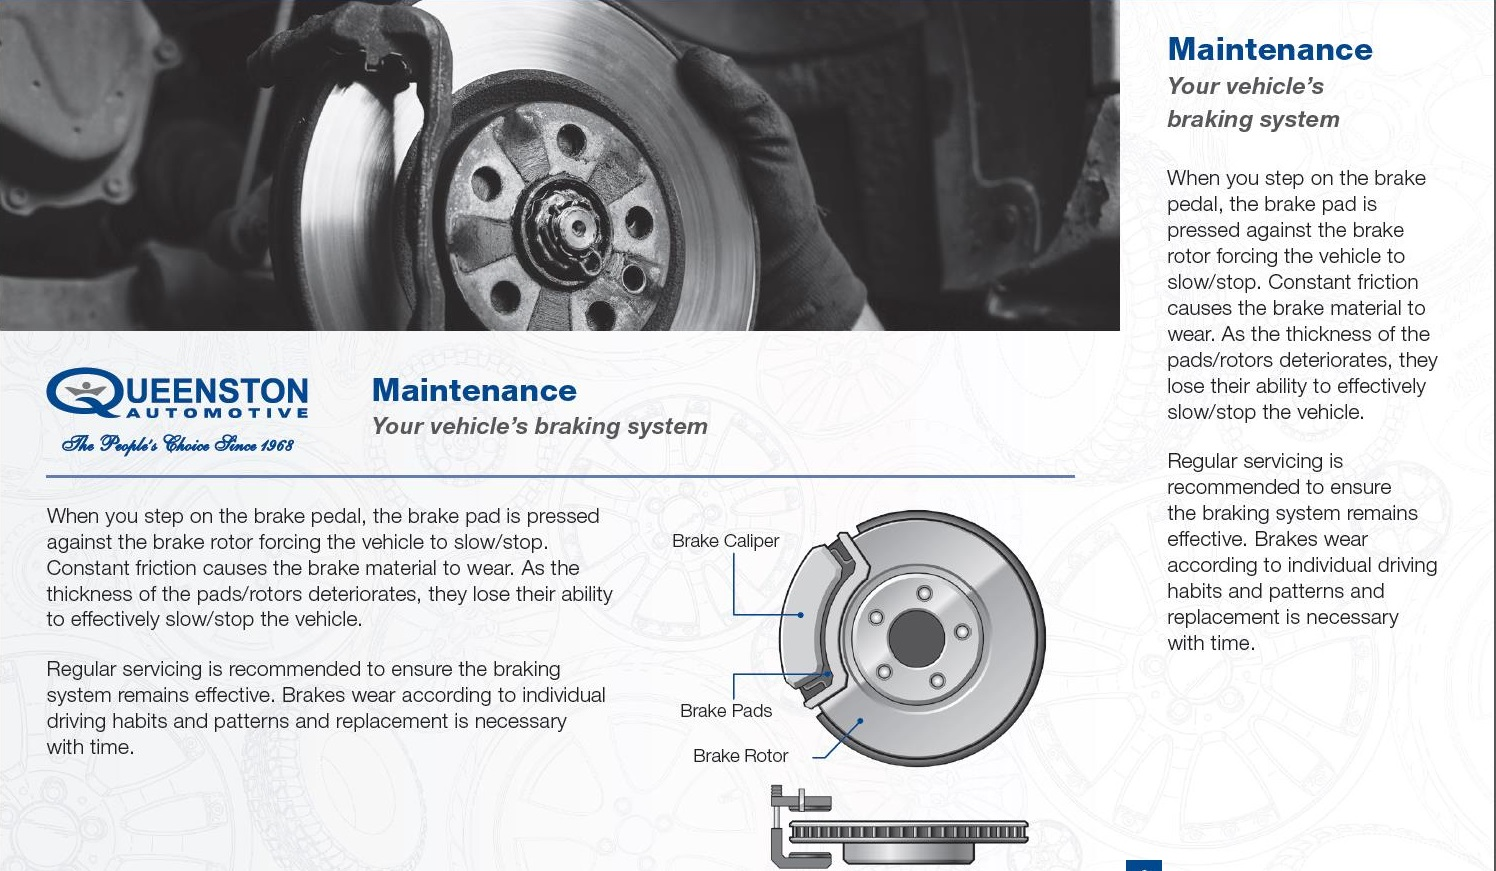 Maintenance_Your_Vehicles_Braking_System